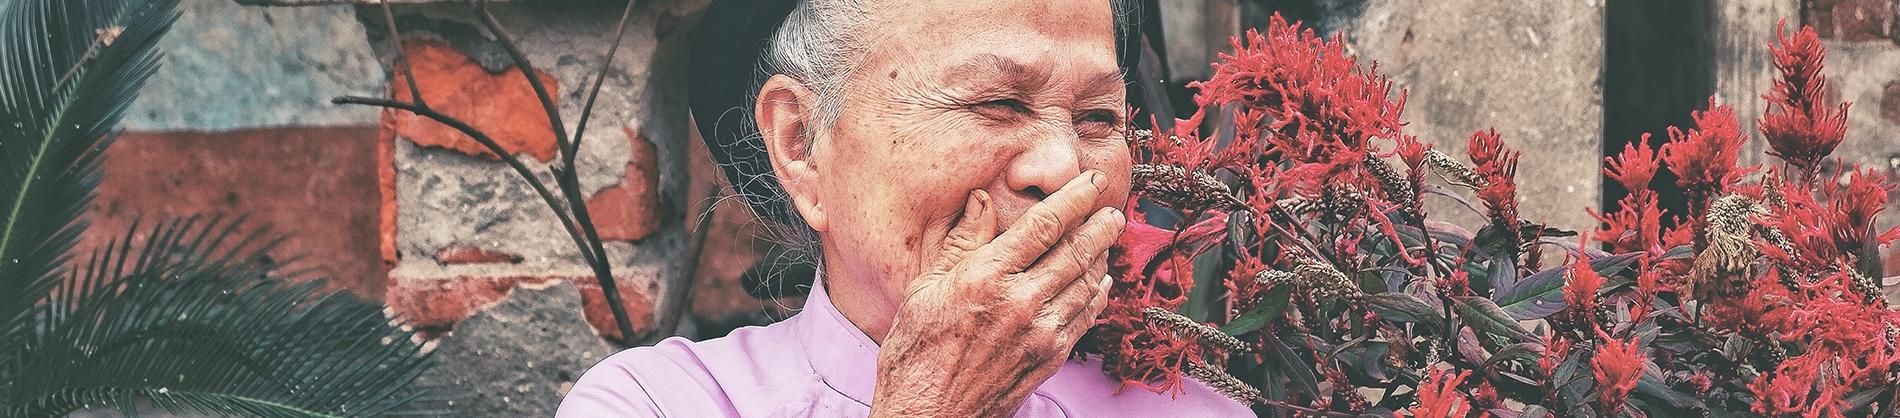 A elderly women laughing